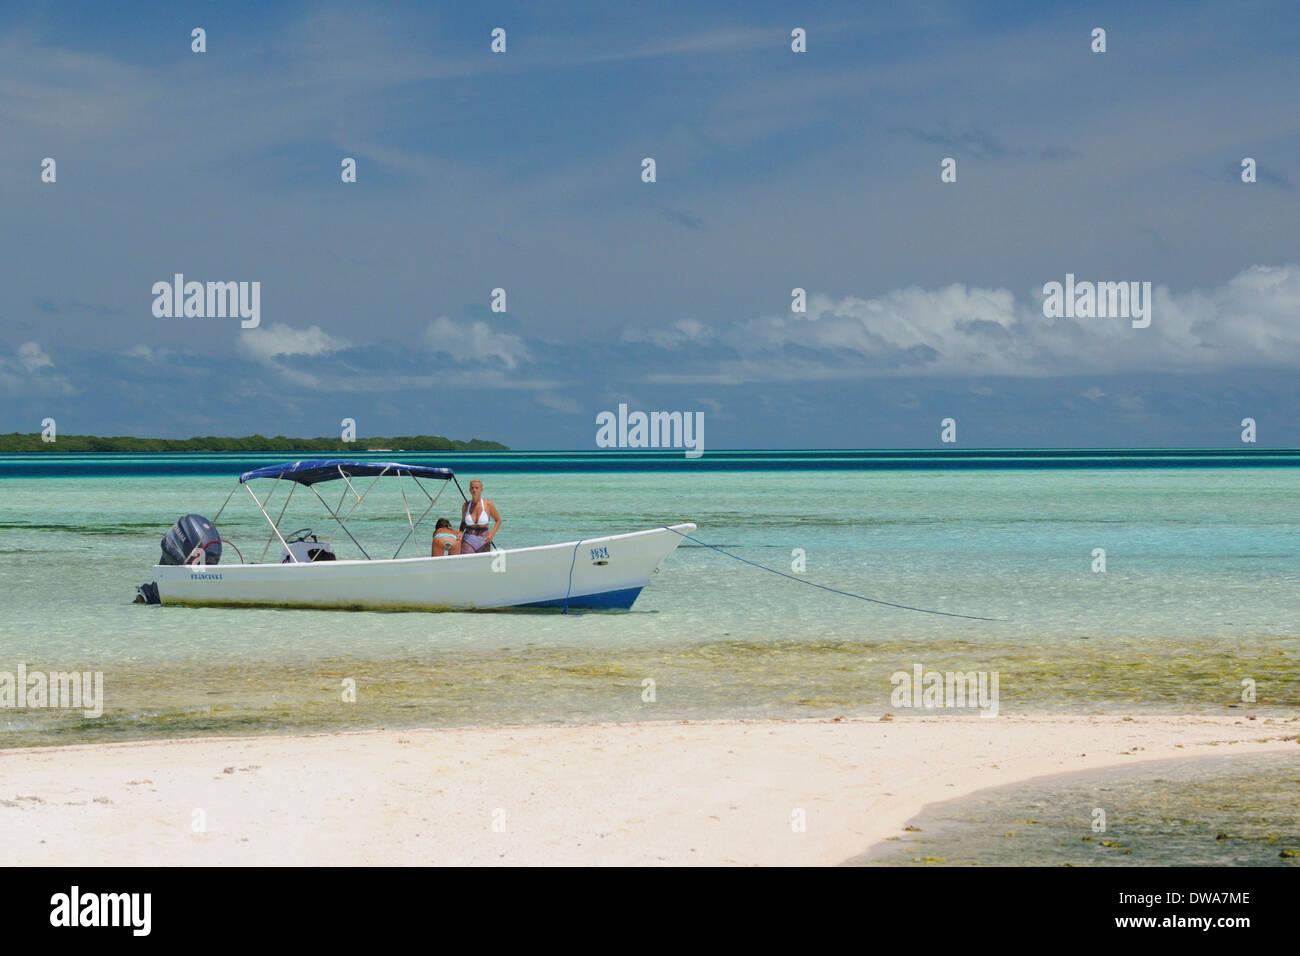 tourist on the boat in to the beach of the Sebastopol reserve , Sebastopol island, Archipelago Los Roques National Park, Venezuela - Stock Image